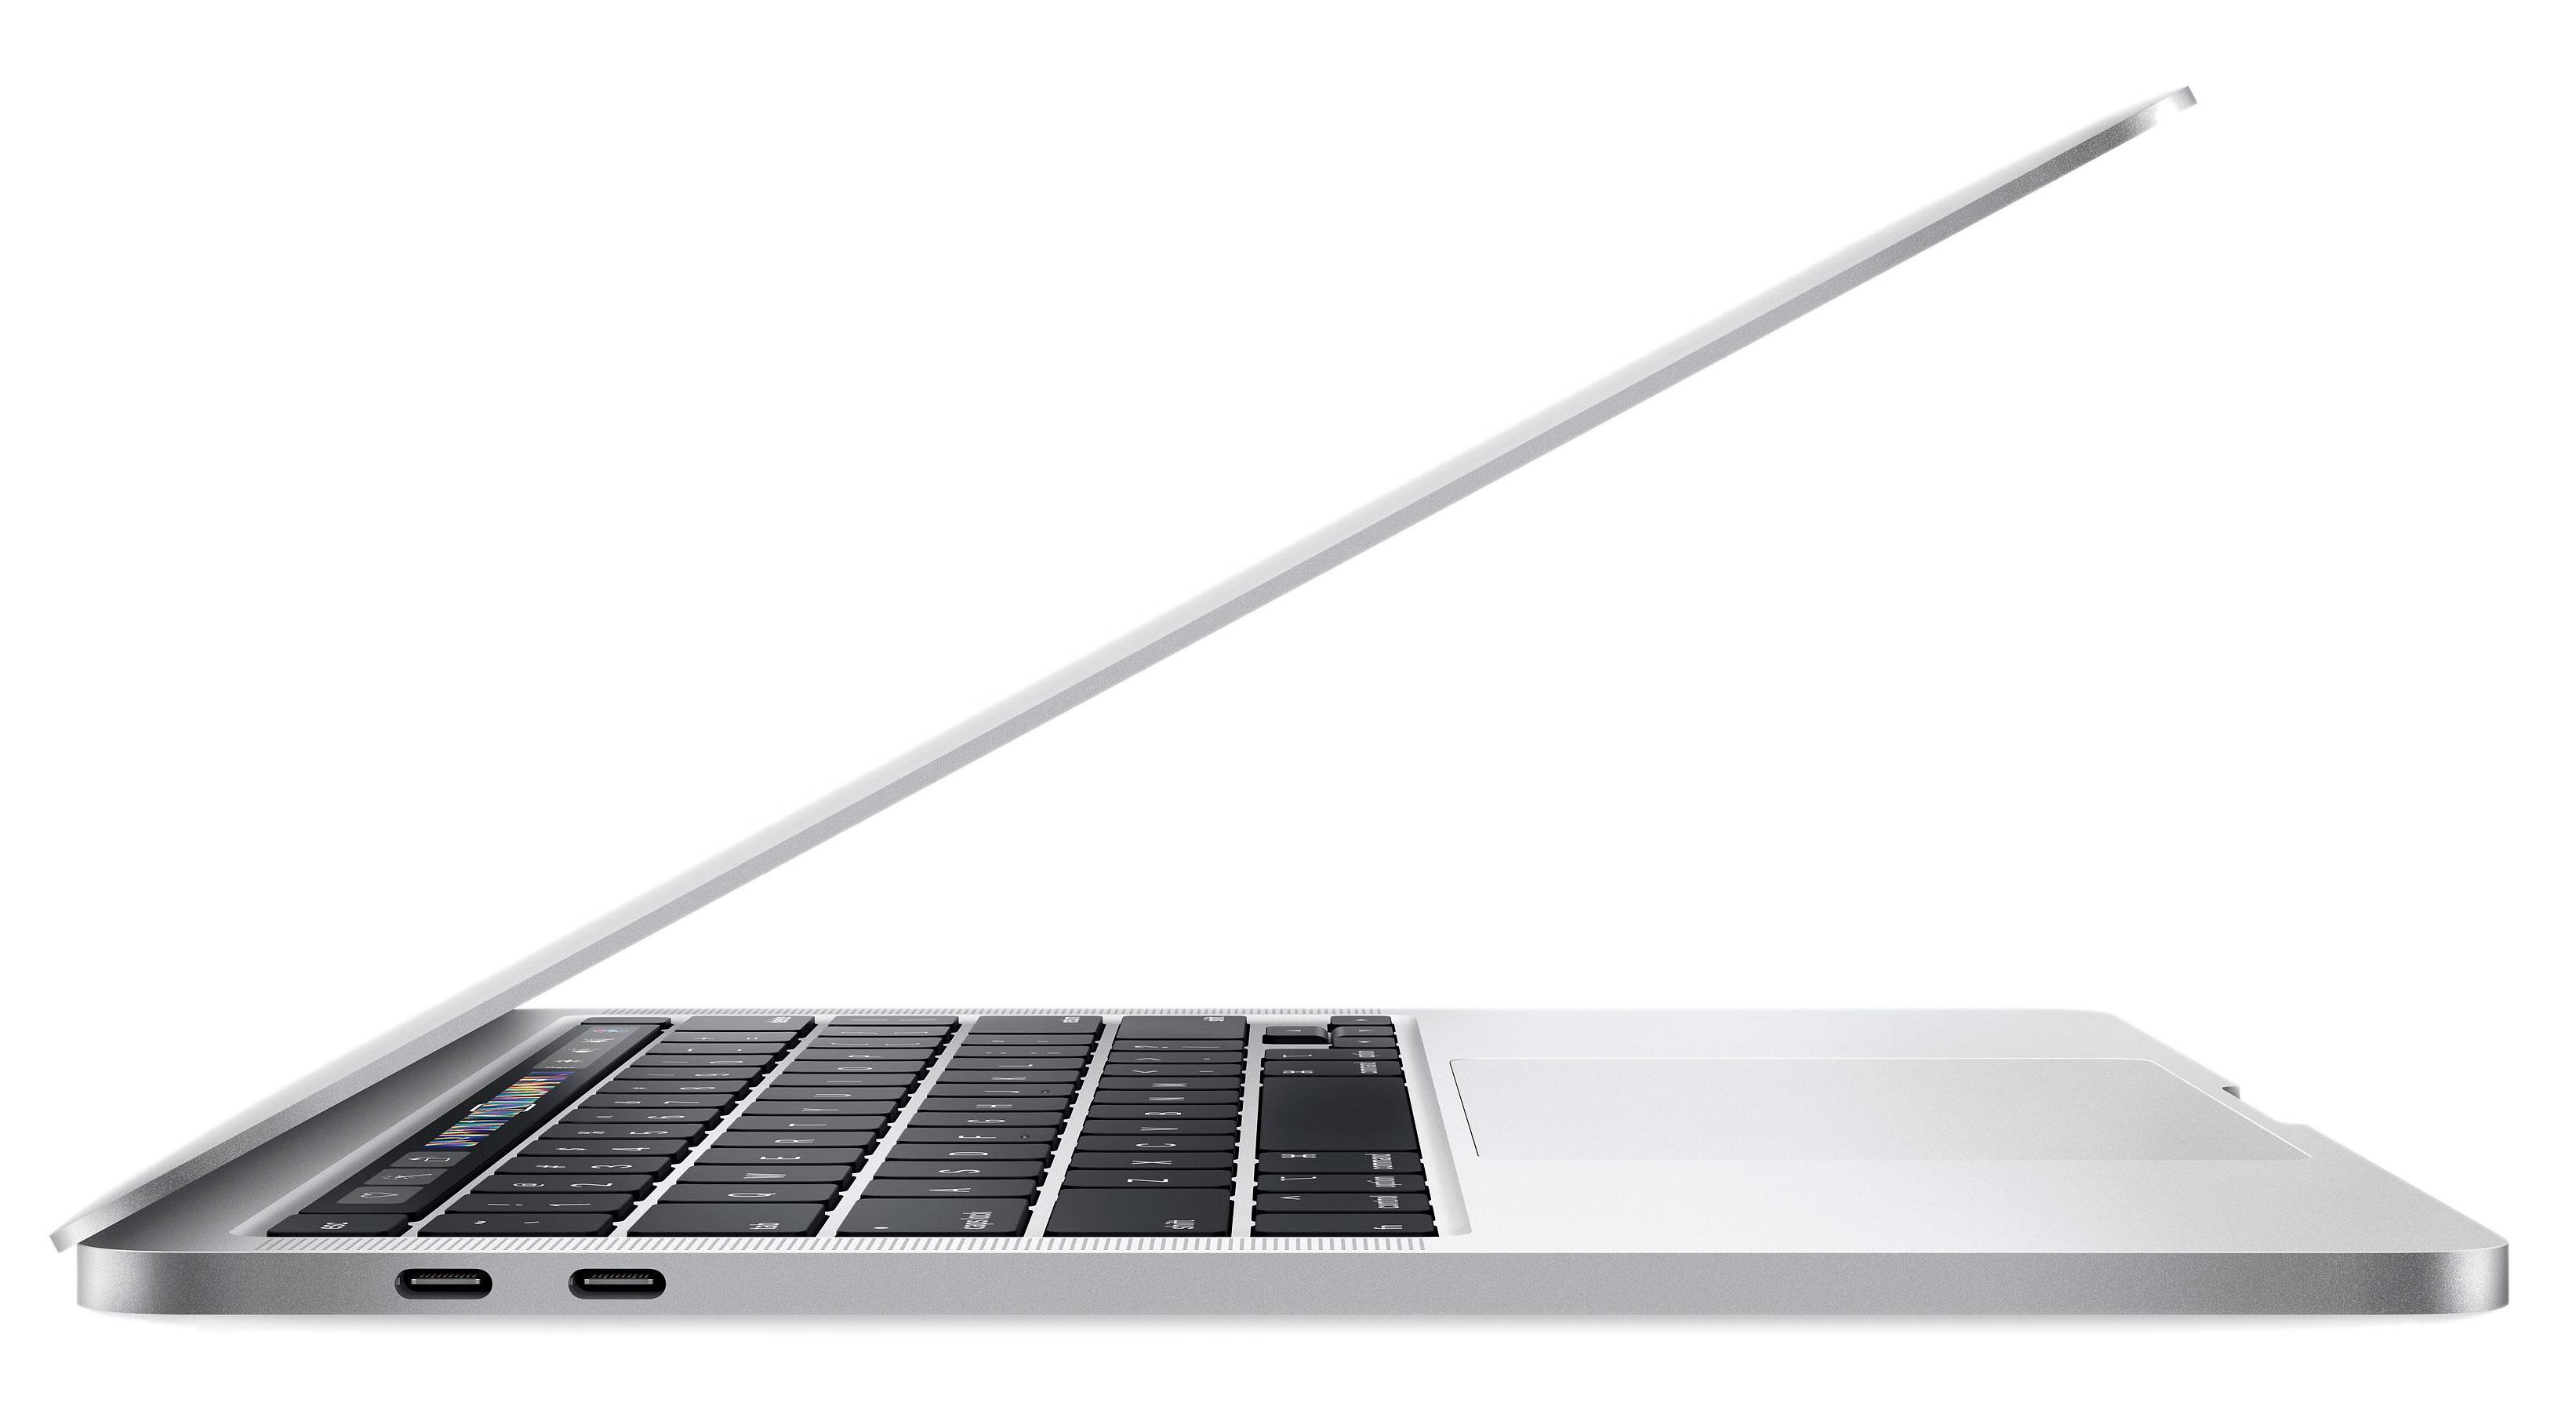 13‑inch MacBook Pro (2020) - Zilver - Intel 2,0‑GHz quad‑coreprocessor - 16 GB RAM - 1 TB SSD - Vier (USB‑C) Thunderbo...